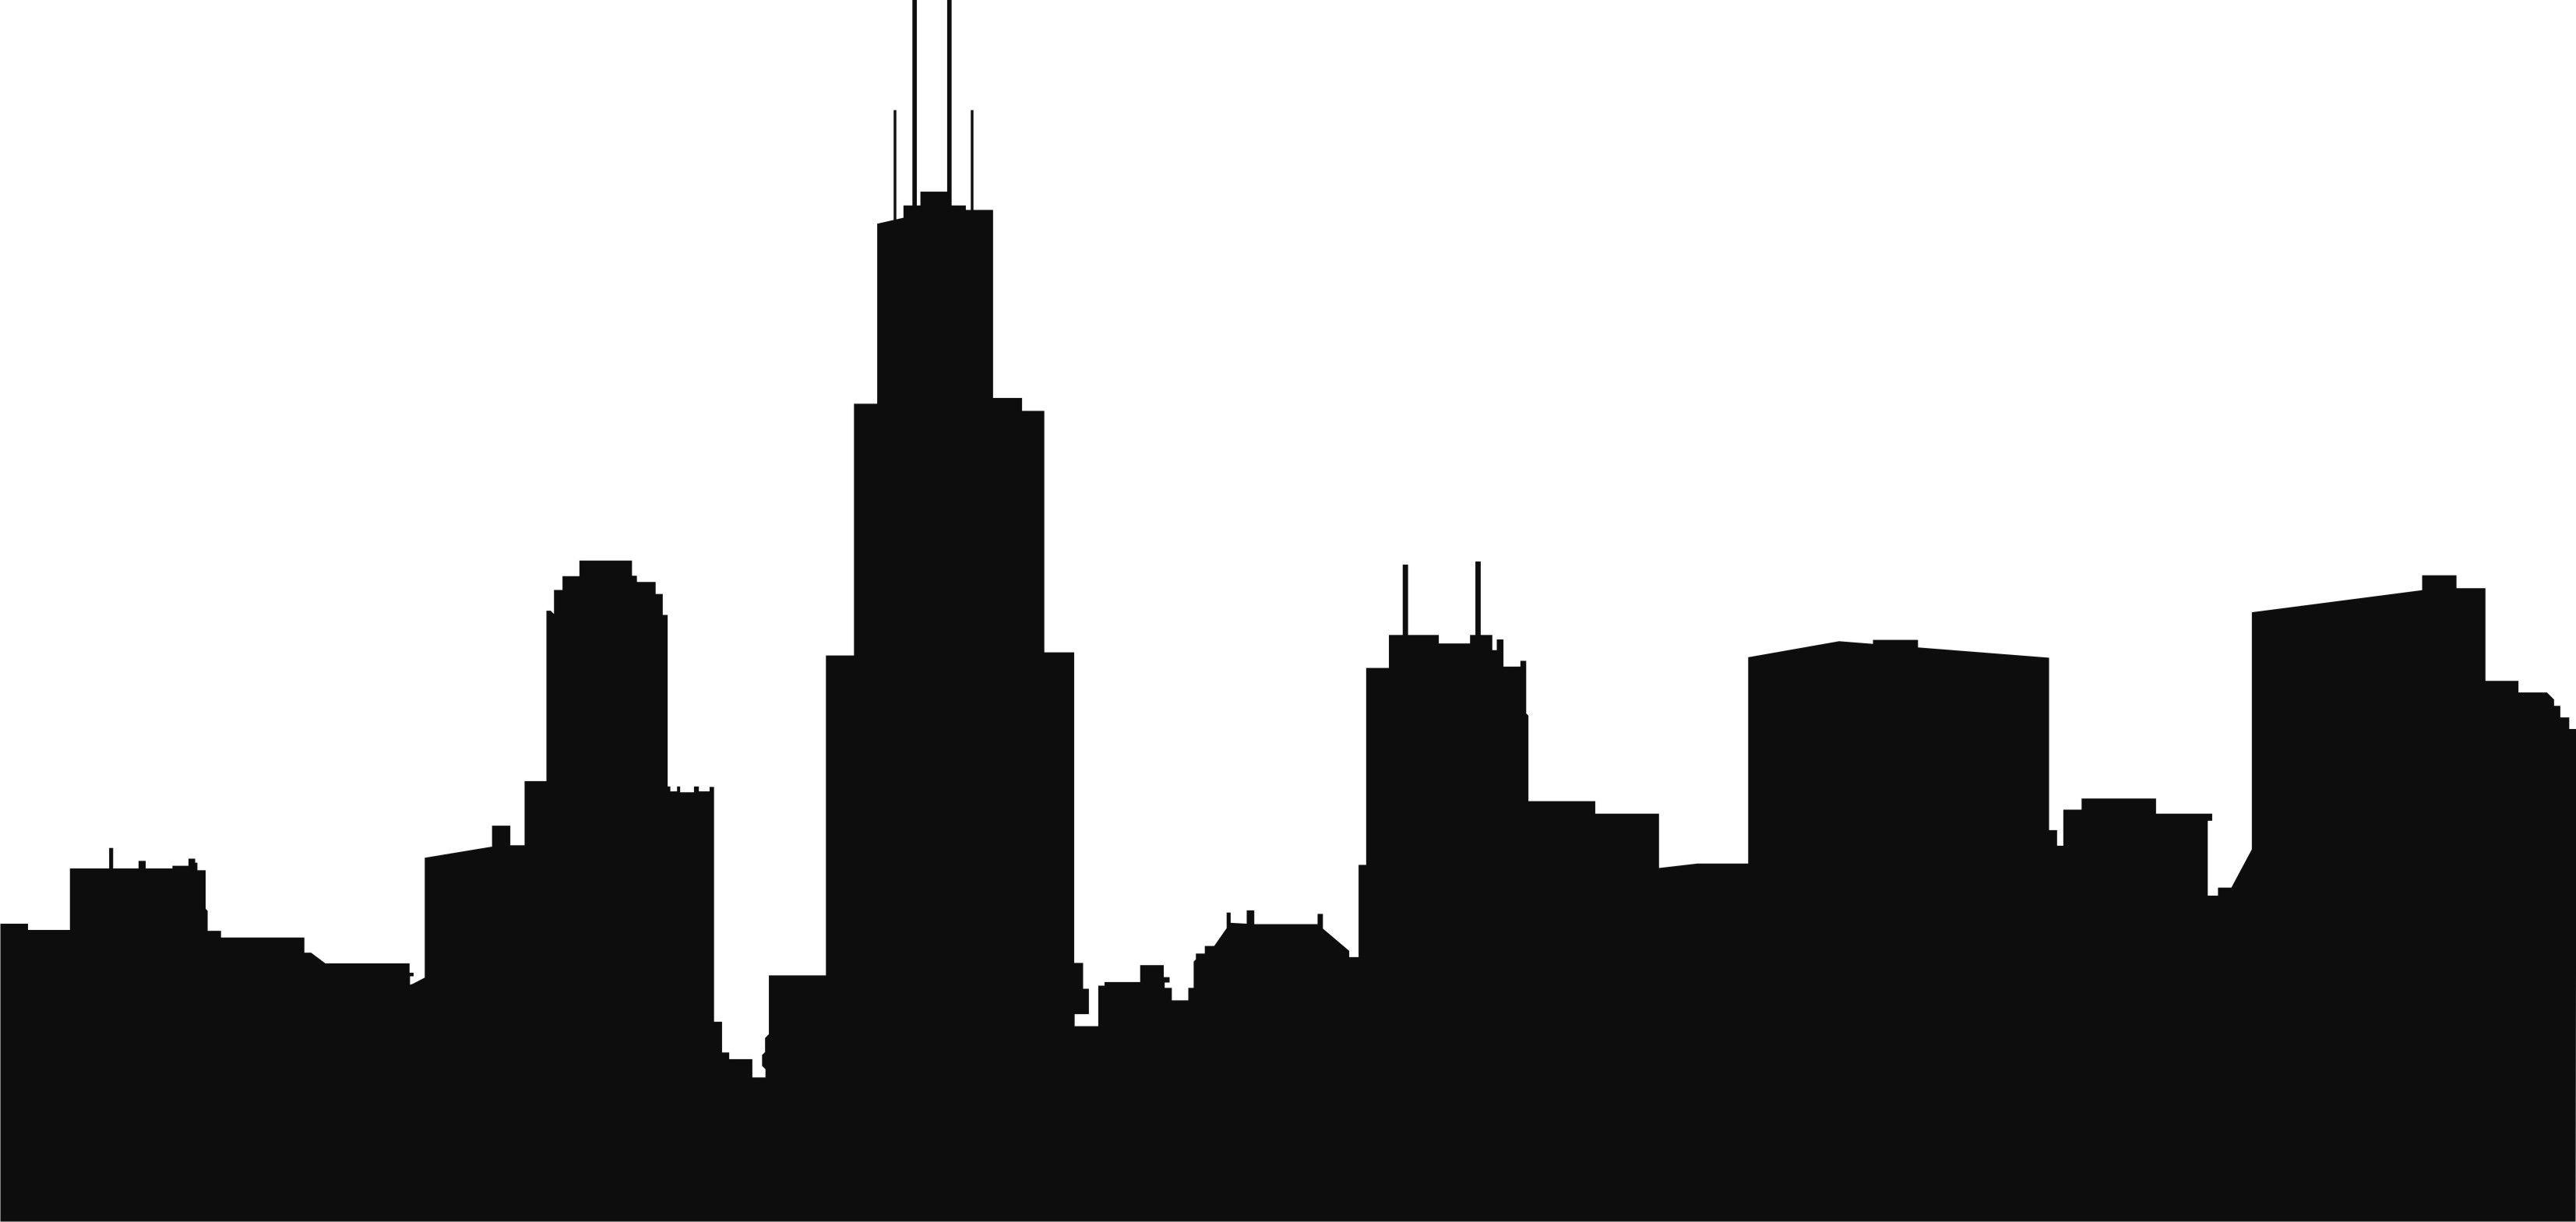 Clipart skyline clipart transparent download Skyline clipart - ClipartFest | Projects to Try | Skyline silhouette ... clipart transparent download